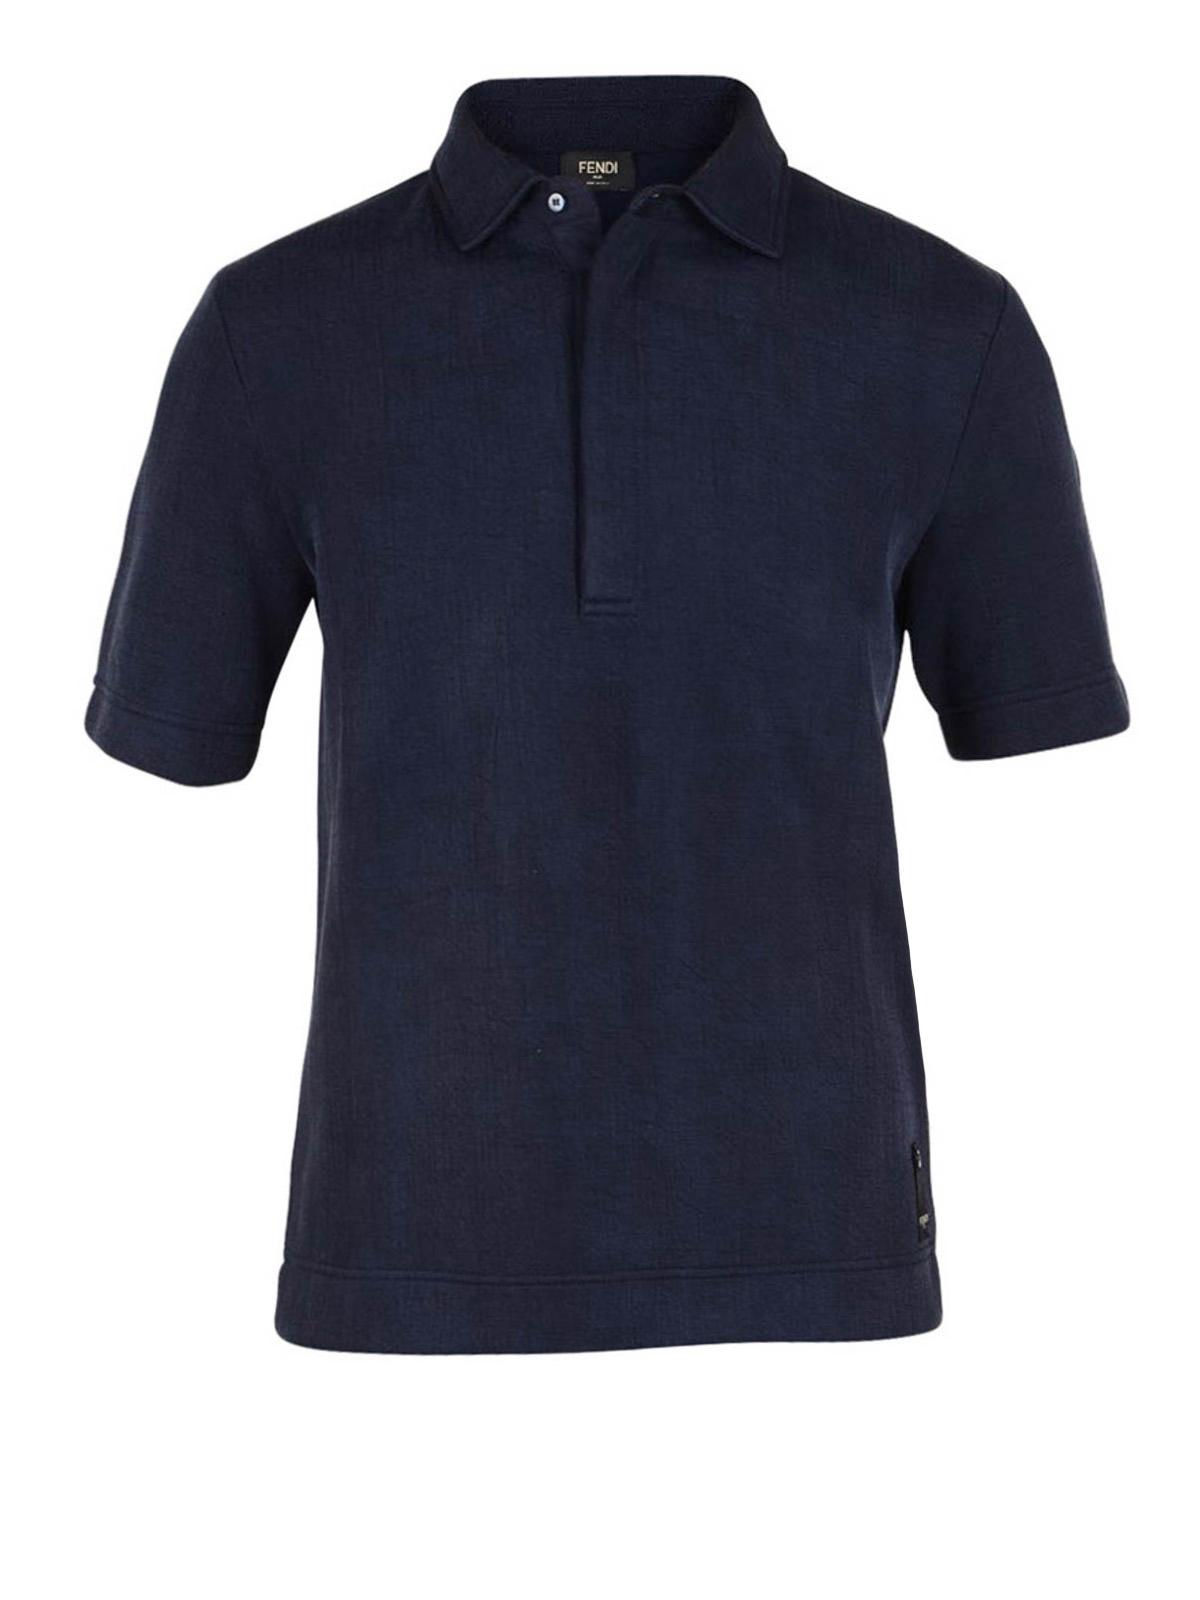 Lightweight Silky Polo Shirt By Fendi Polo Shirts Ikrix